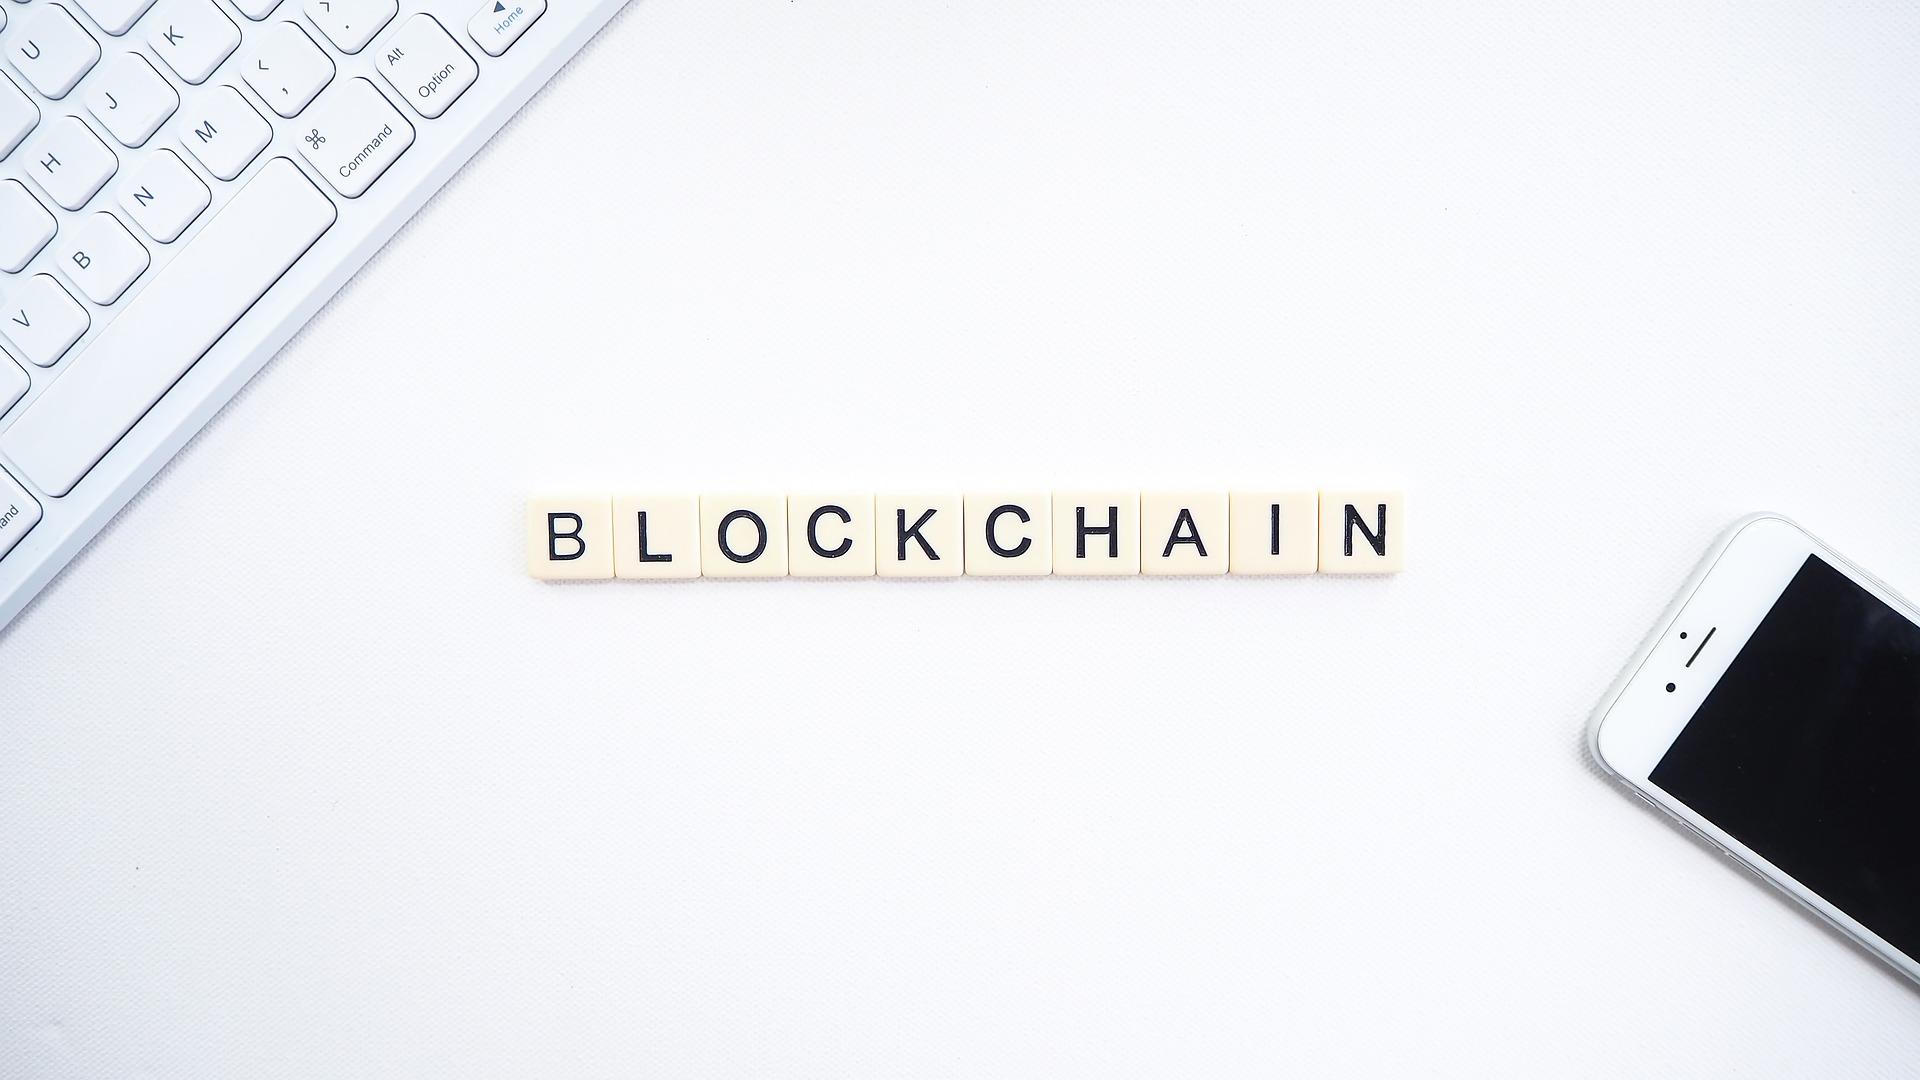 Blockchain-based Game Sorare Raises $50 Million in Funding Round